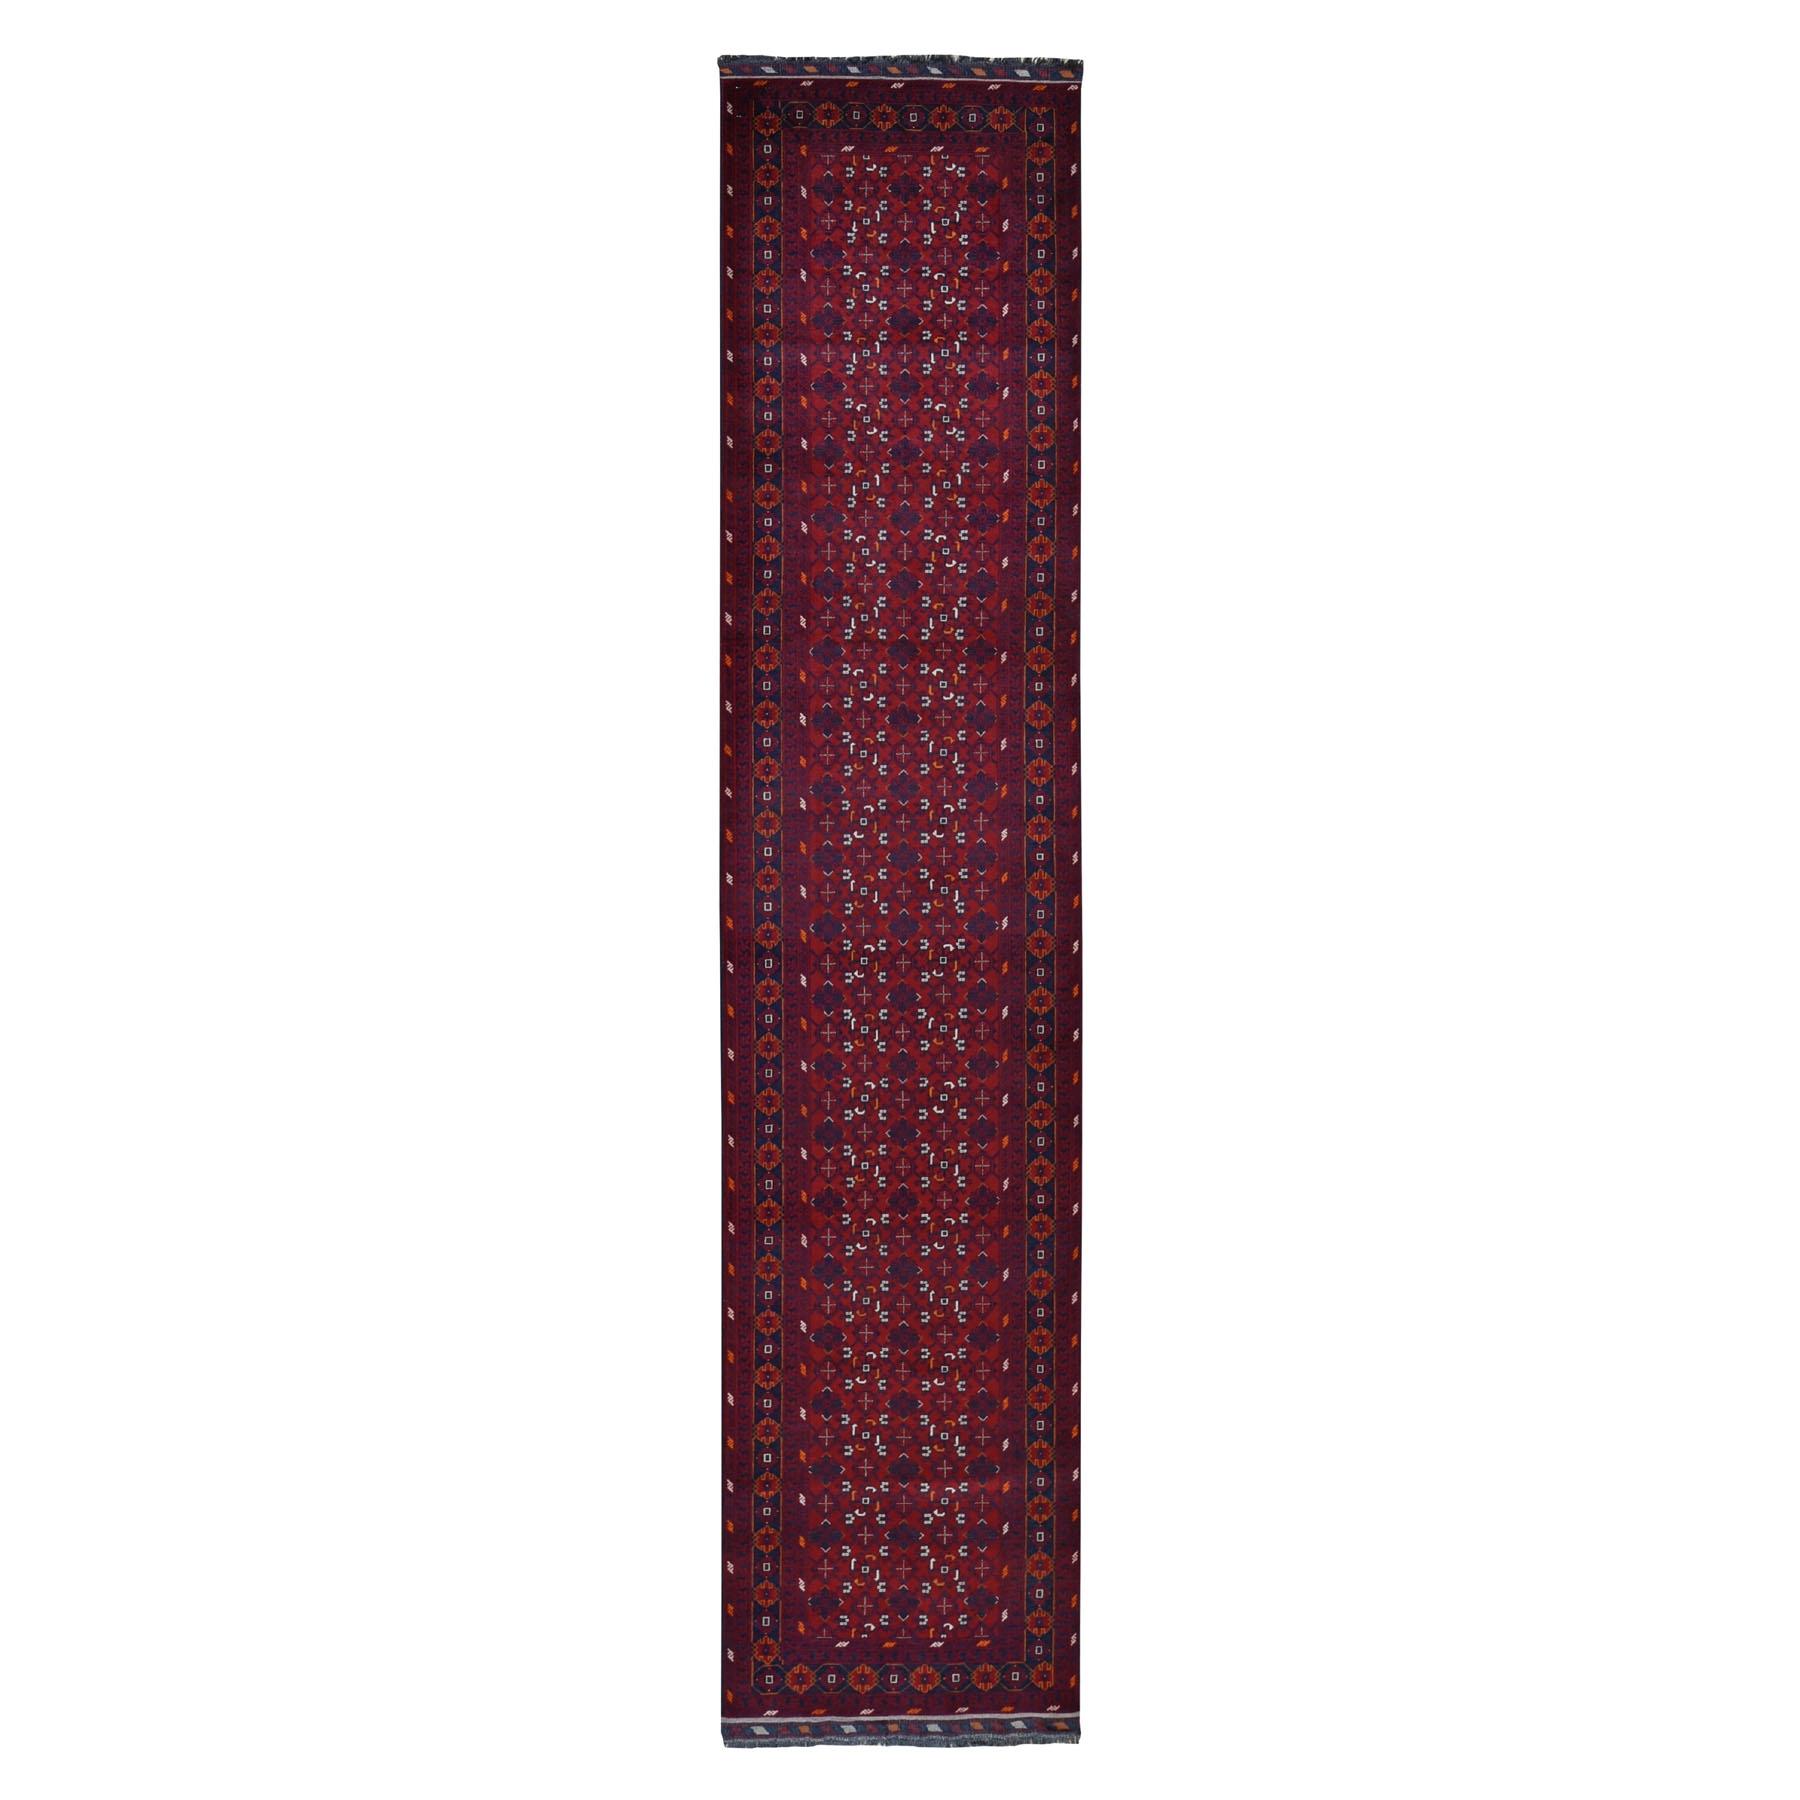 "2'9""x12'9"" Afghan Khamyab Silky Wool Runner Hand Knotted Oriental Rug"